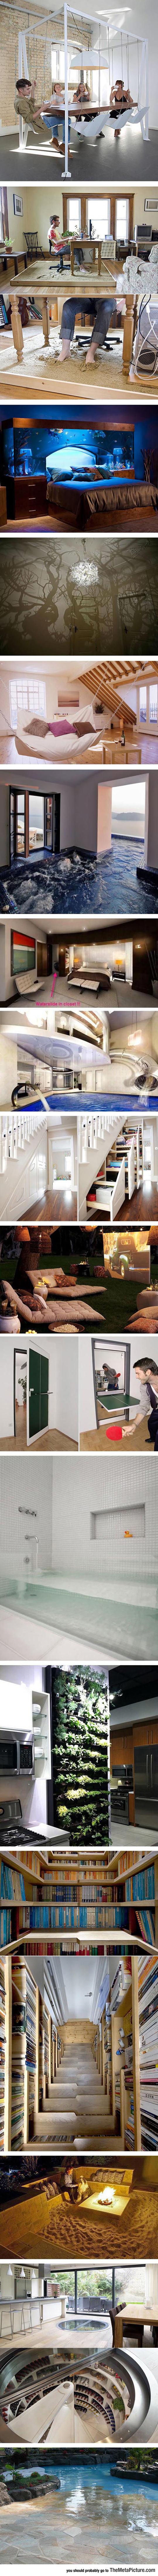 DIY-awesome-house-ideas-innovation